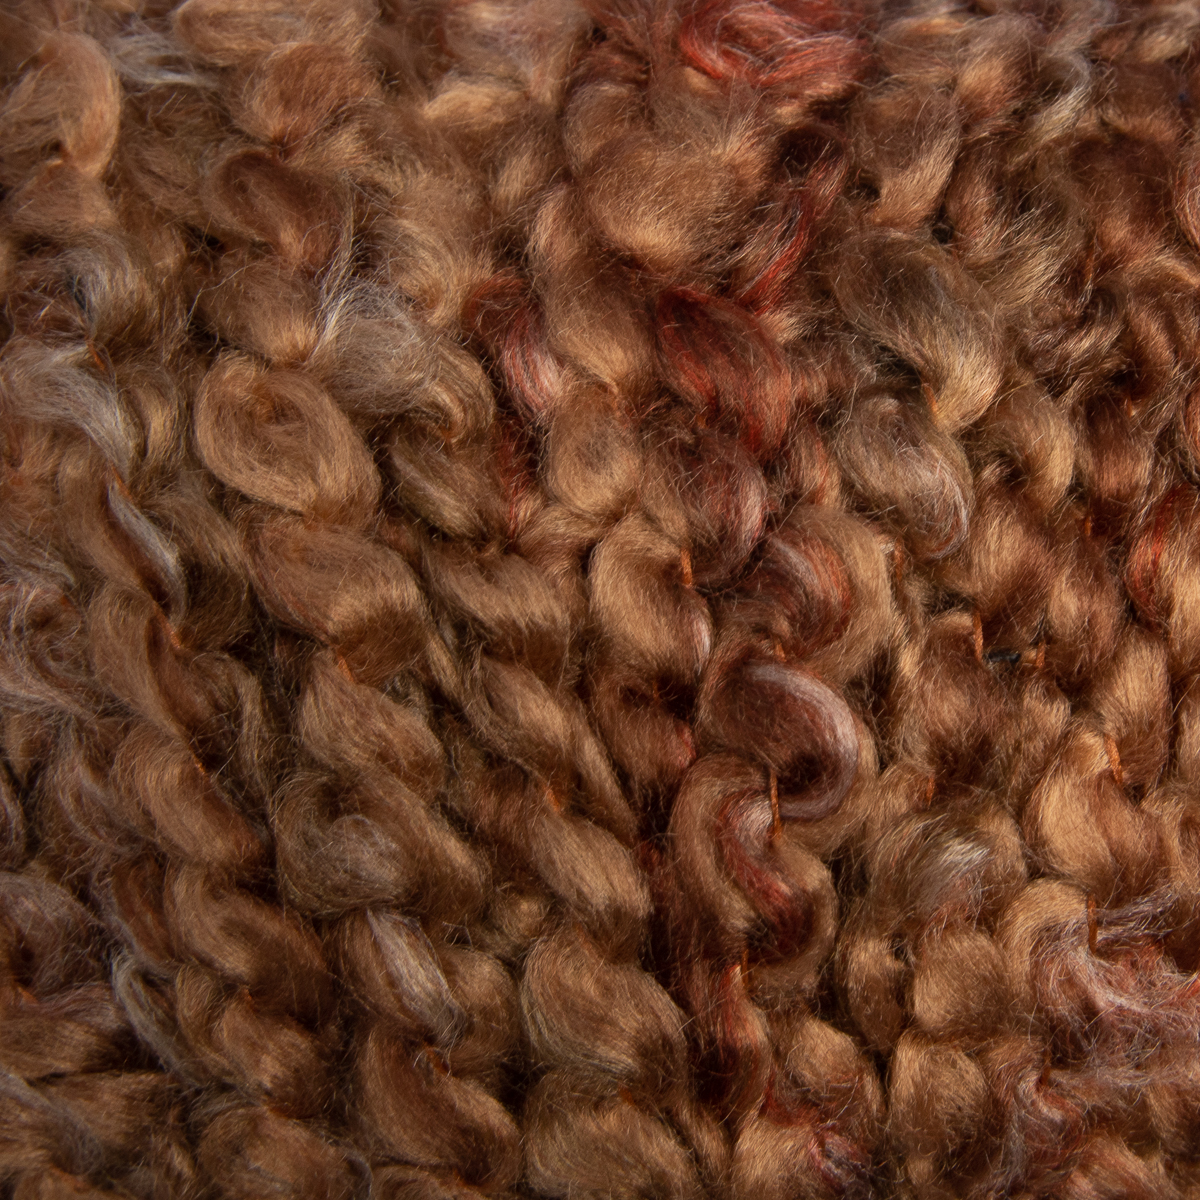 3-Lion-Brand-Homespun-Thick-amp-Quick-Acrylic-Yarn-Super-Bulky-6-Knit-Skeins-Soft thumbnail 15